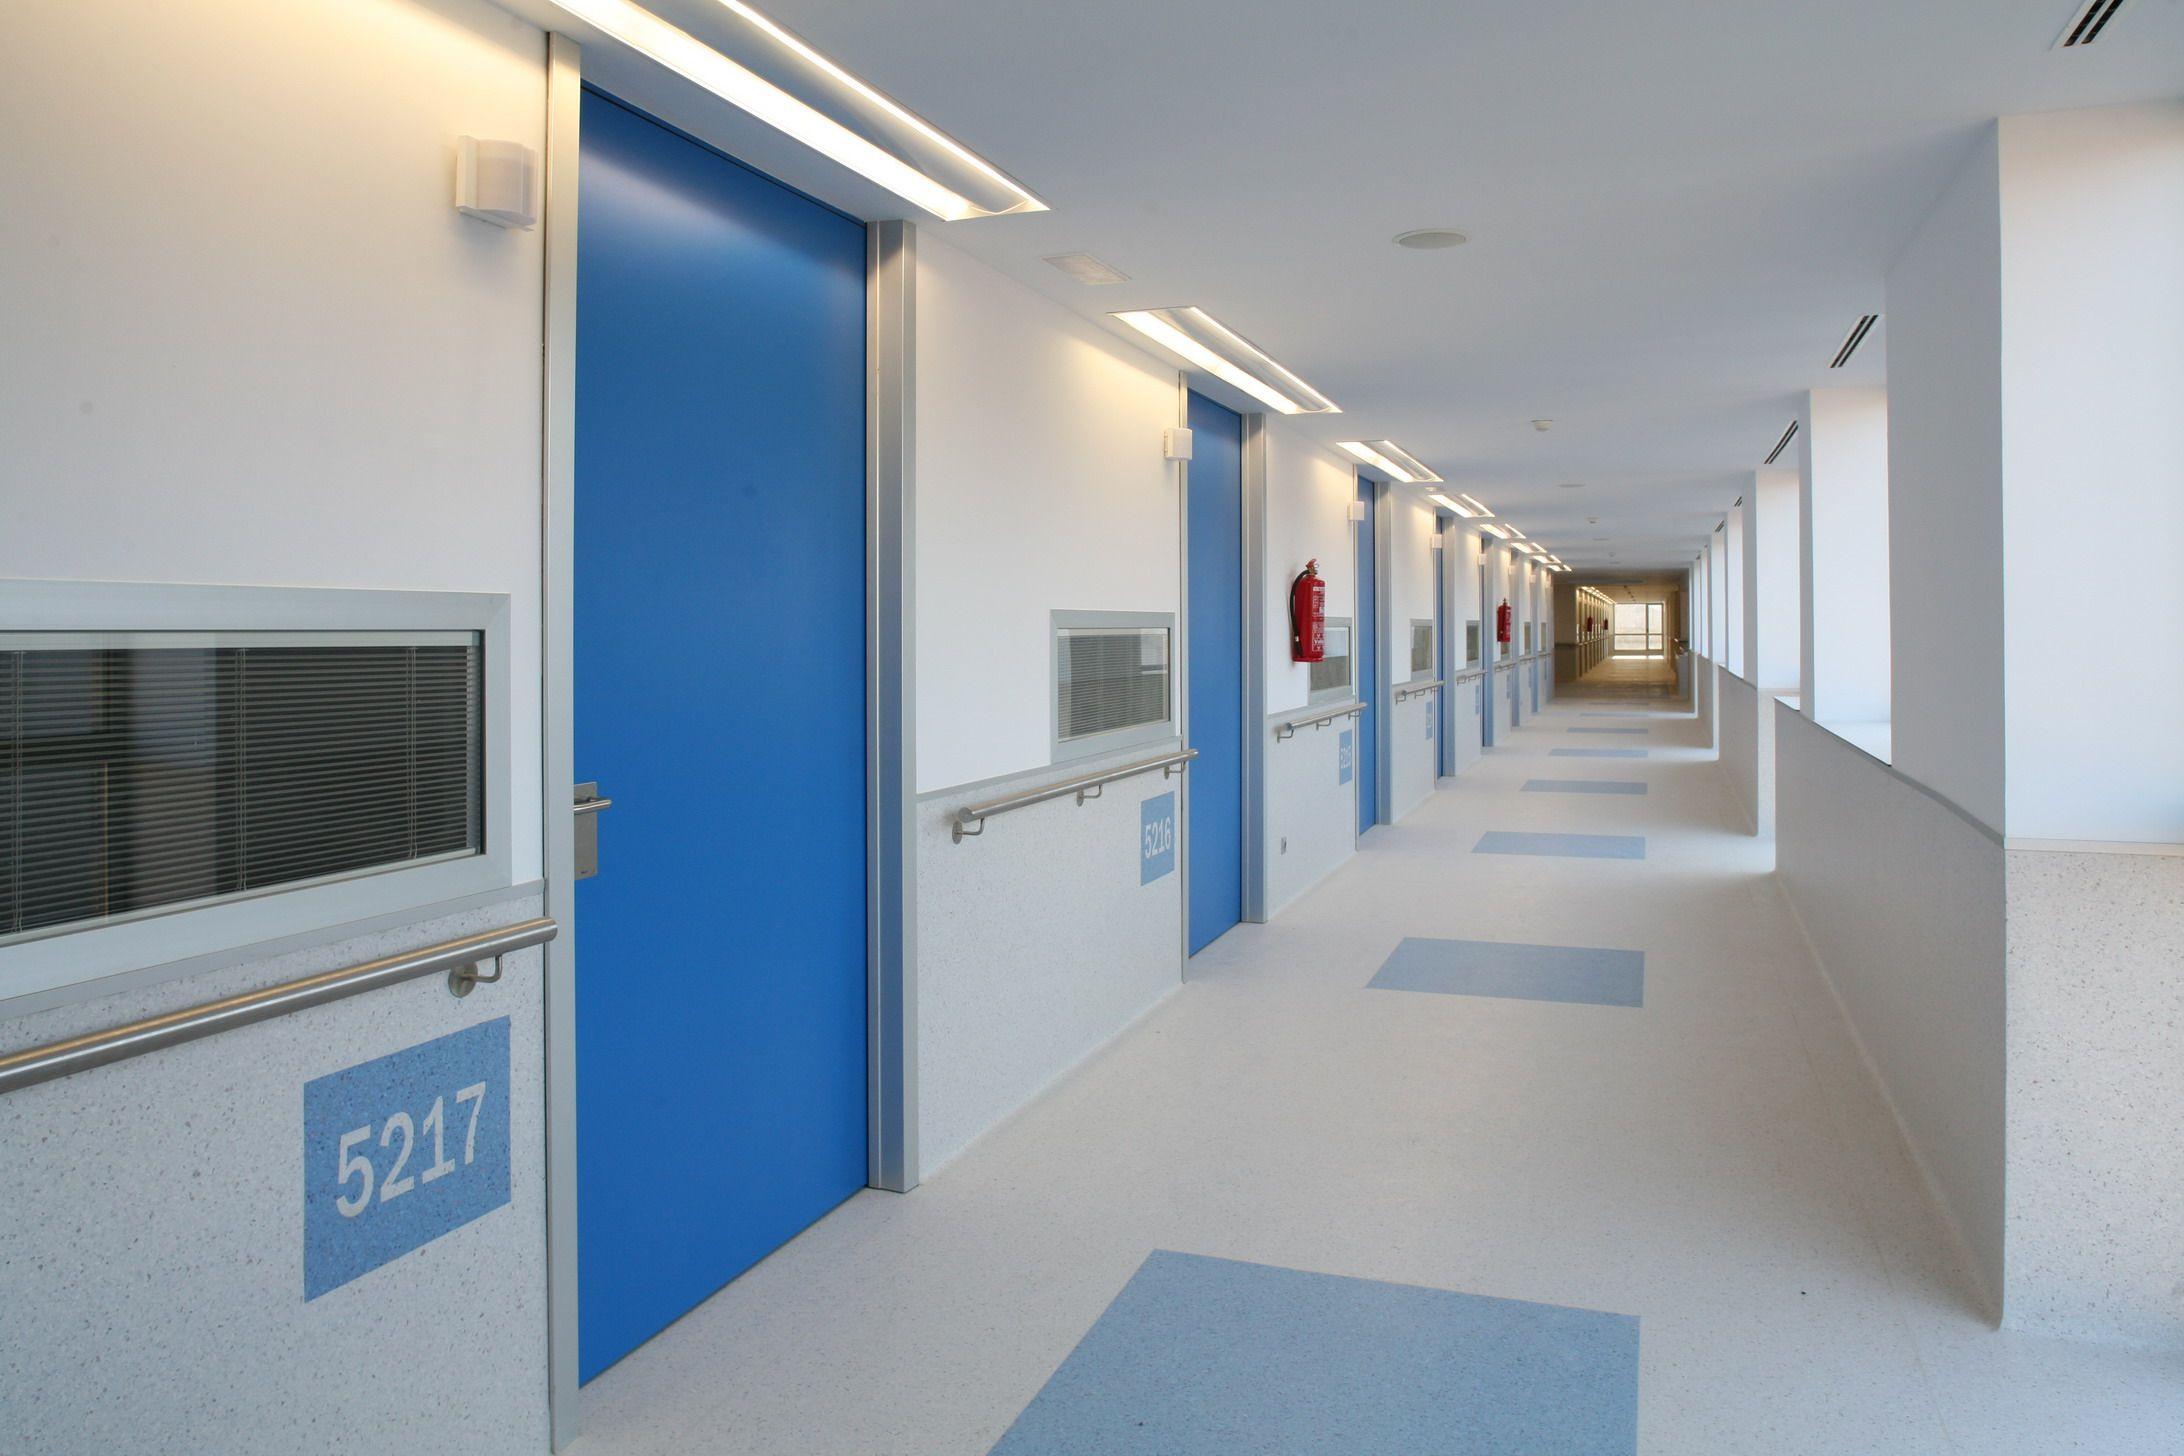 Hospital Corridor Lighting Design: Hospital Corridor - Google Search …